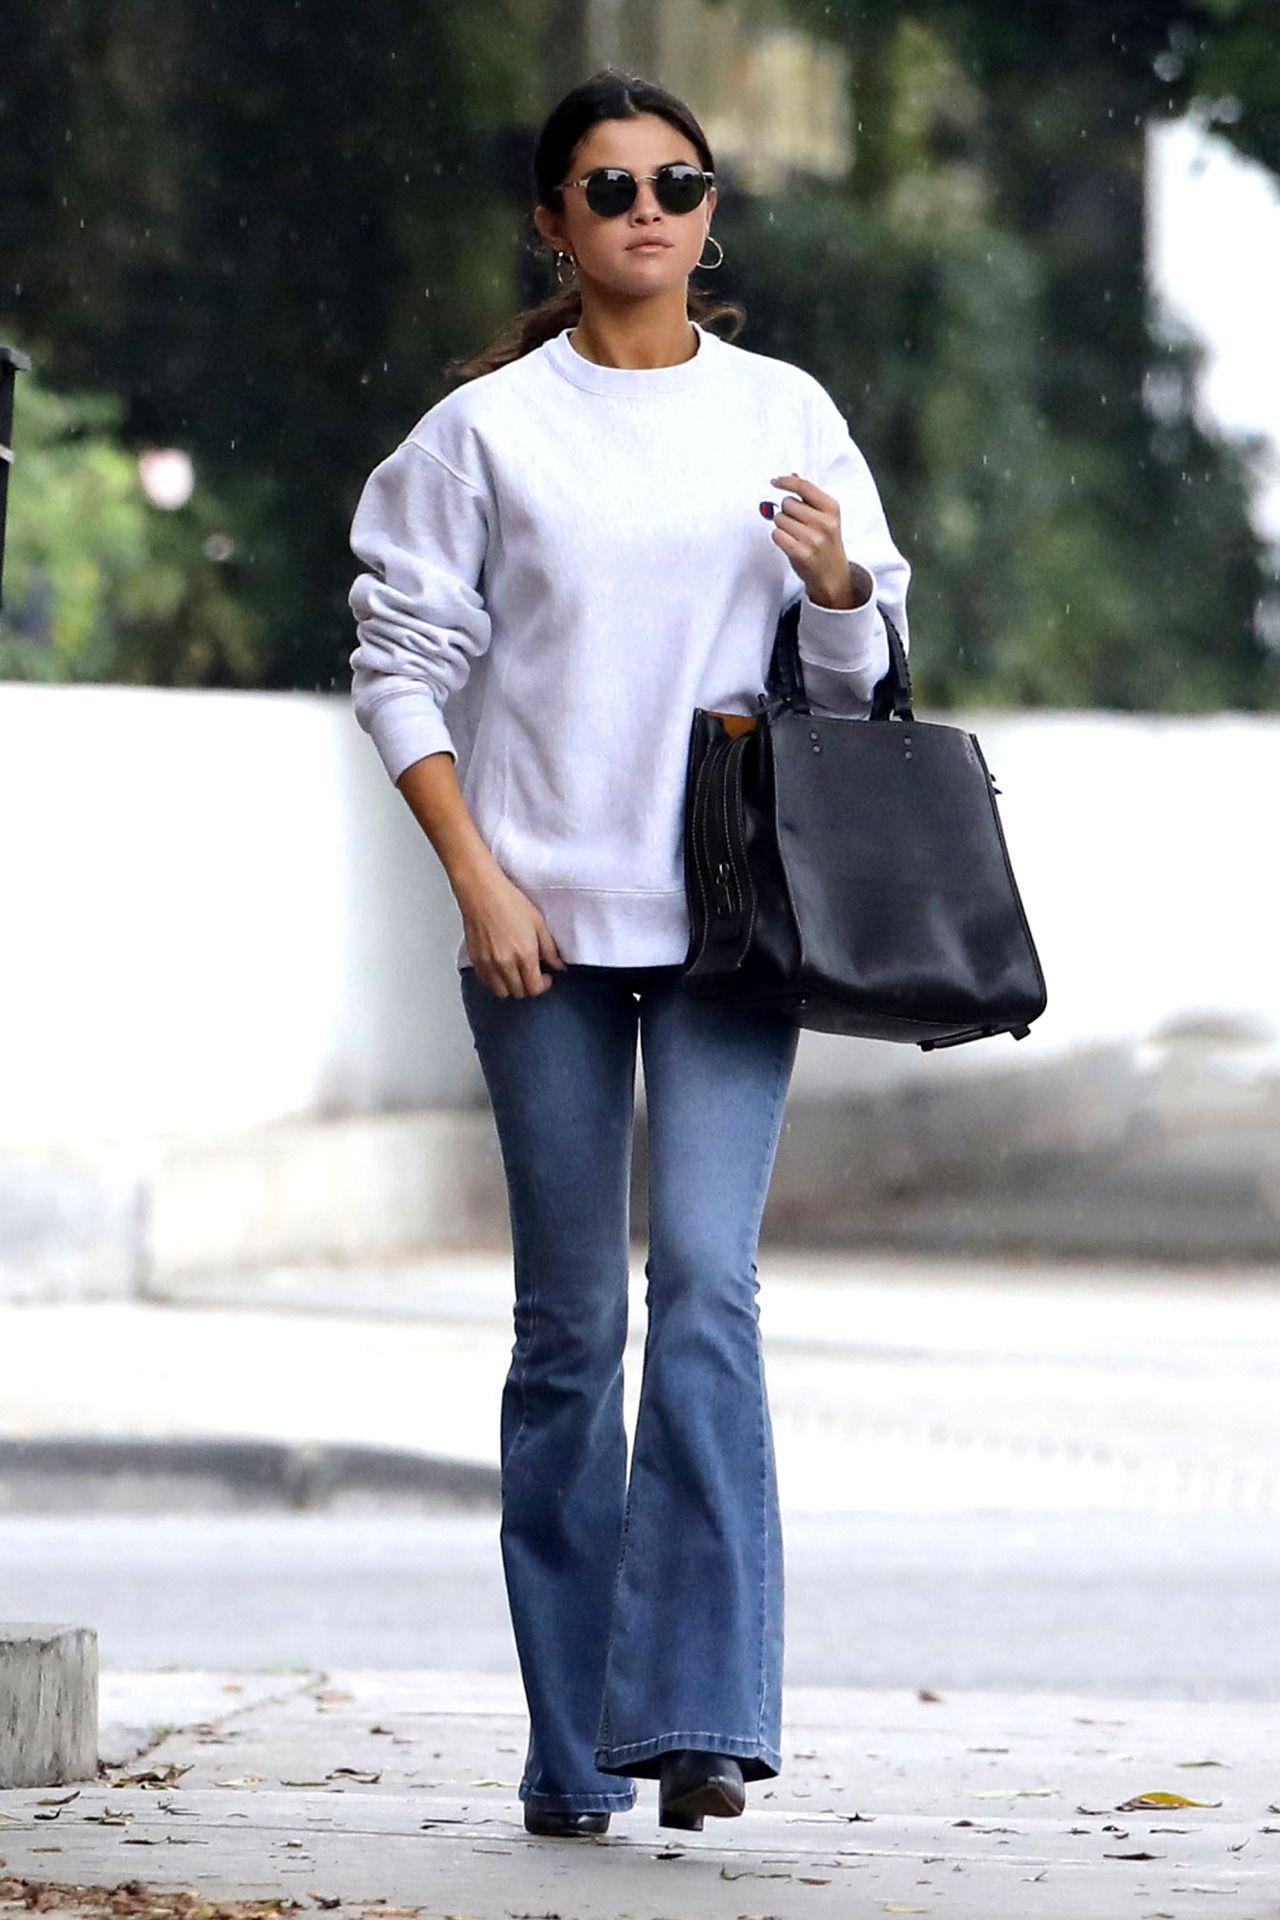 Predownload: Selena Gomez News Photo Fashion Selena Gomez Outfits Selena Gomez Street Style [ 1920 x 1280 Pixel ]